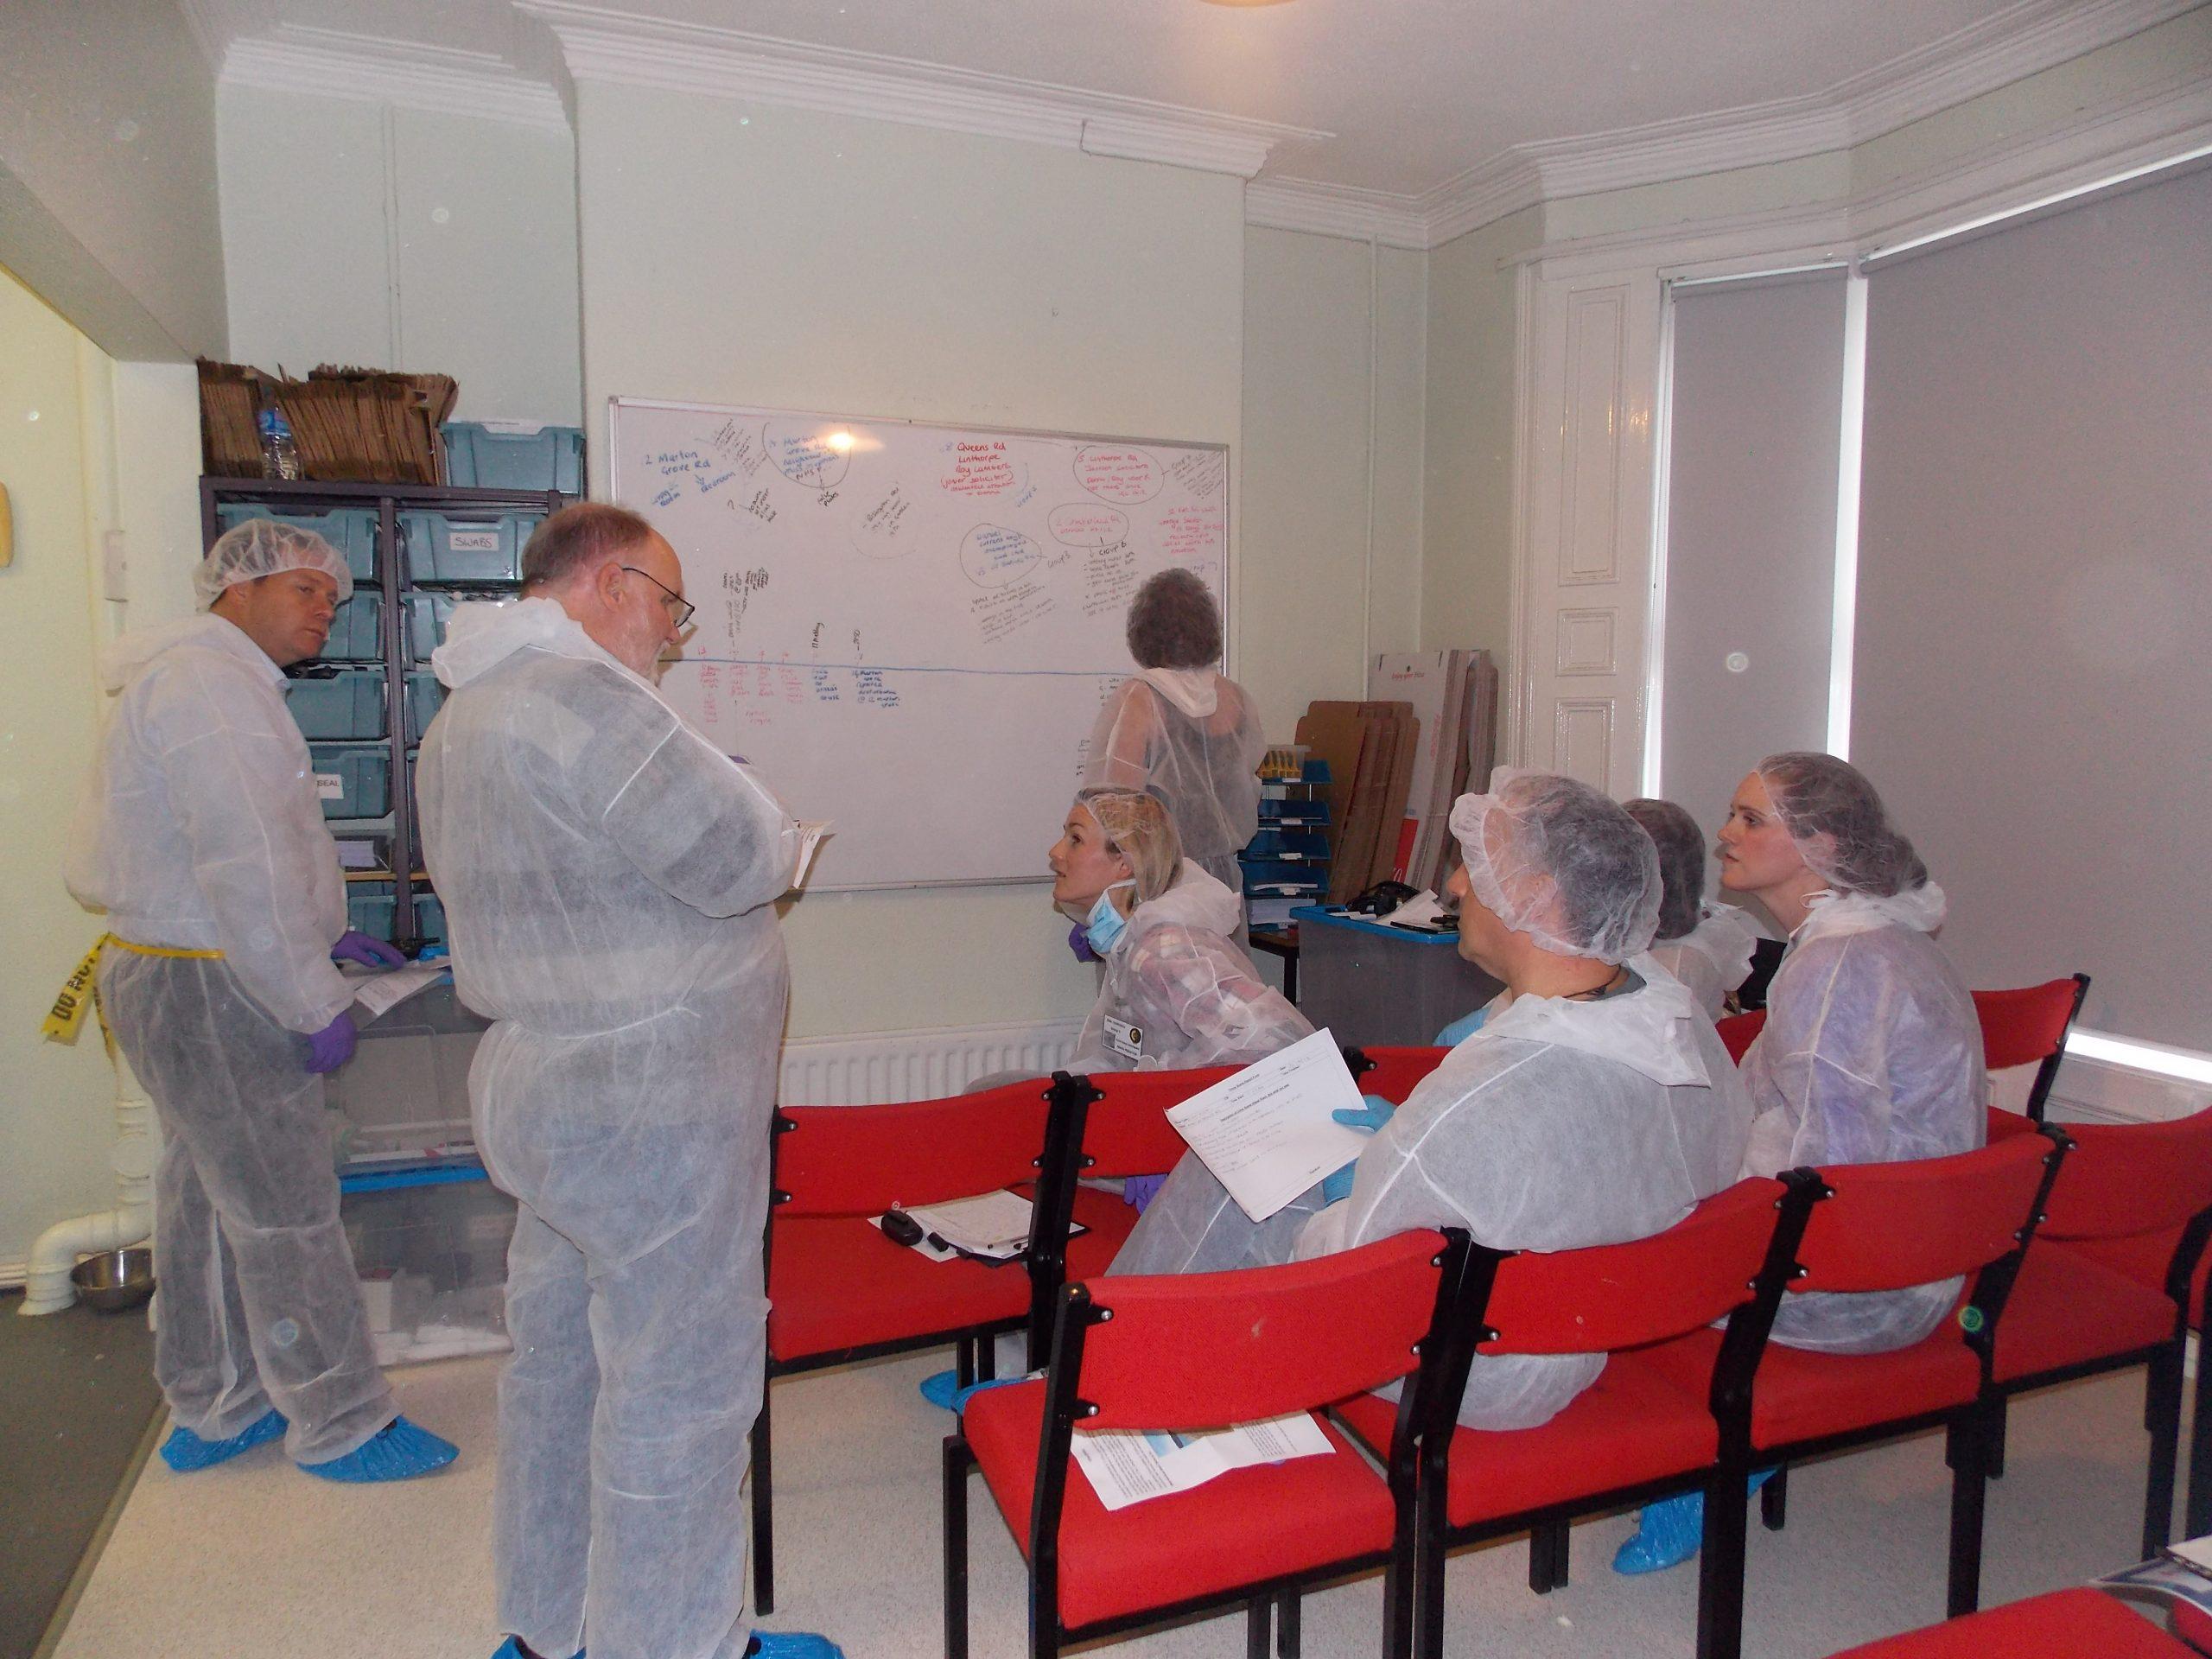 CSI Training and Events - Delegates building a timeline a CSI team building event